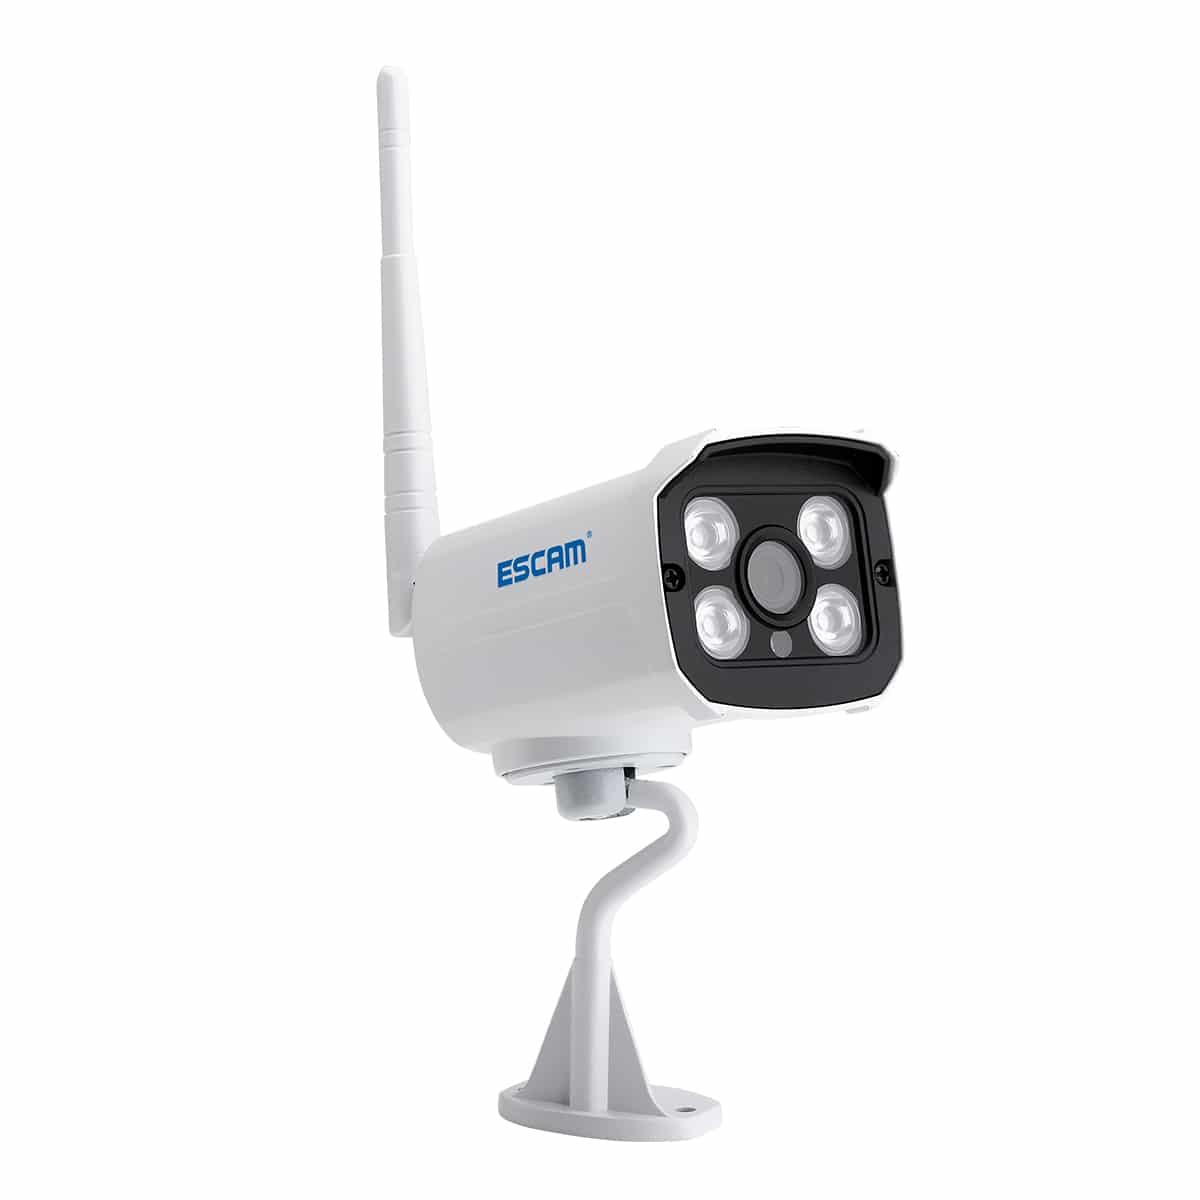 WNK803 ipcamera kit 5